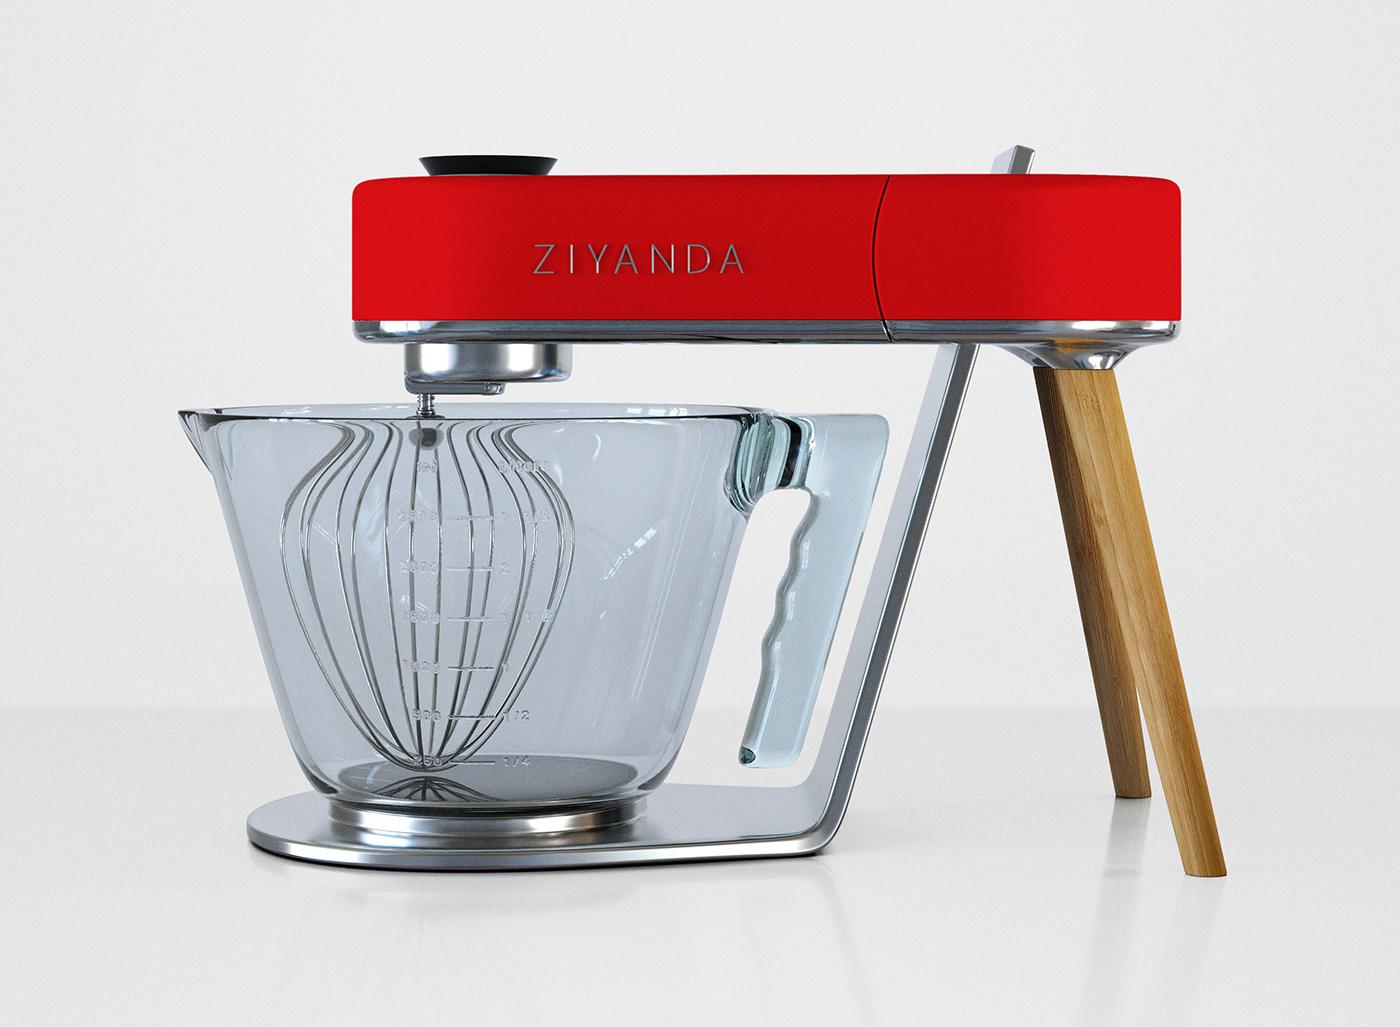 Modern Exhibition Stand Mixer : Ziyanda stand mixer on wacom gallery